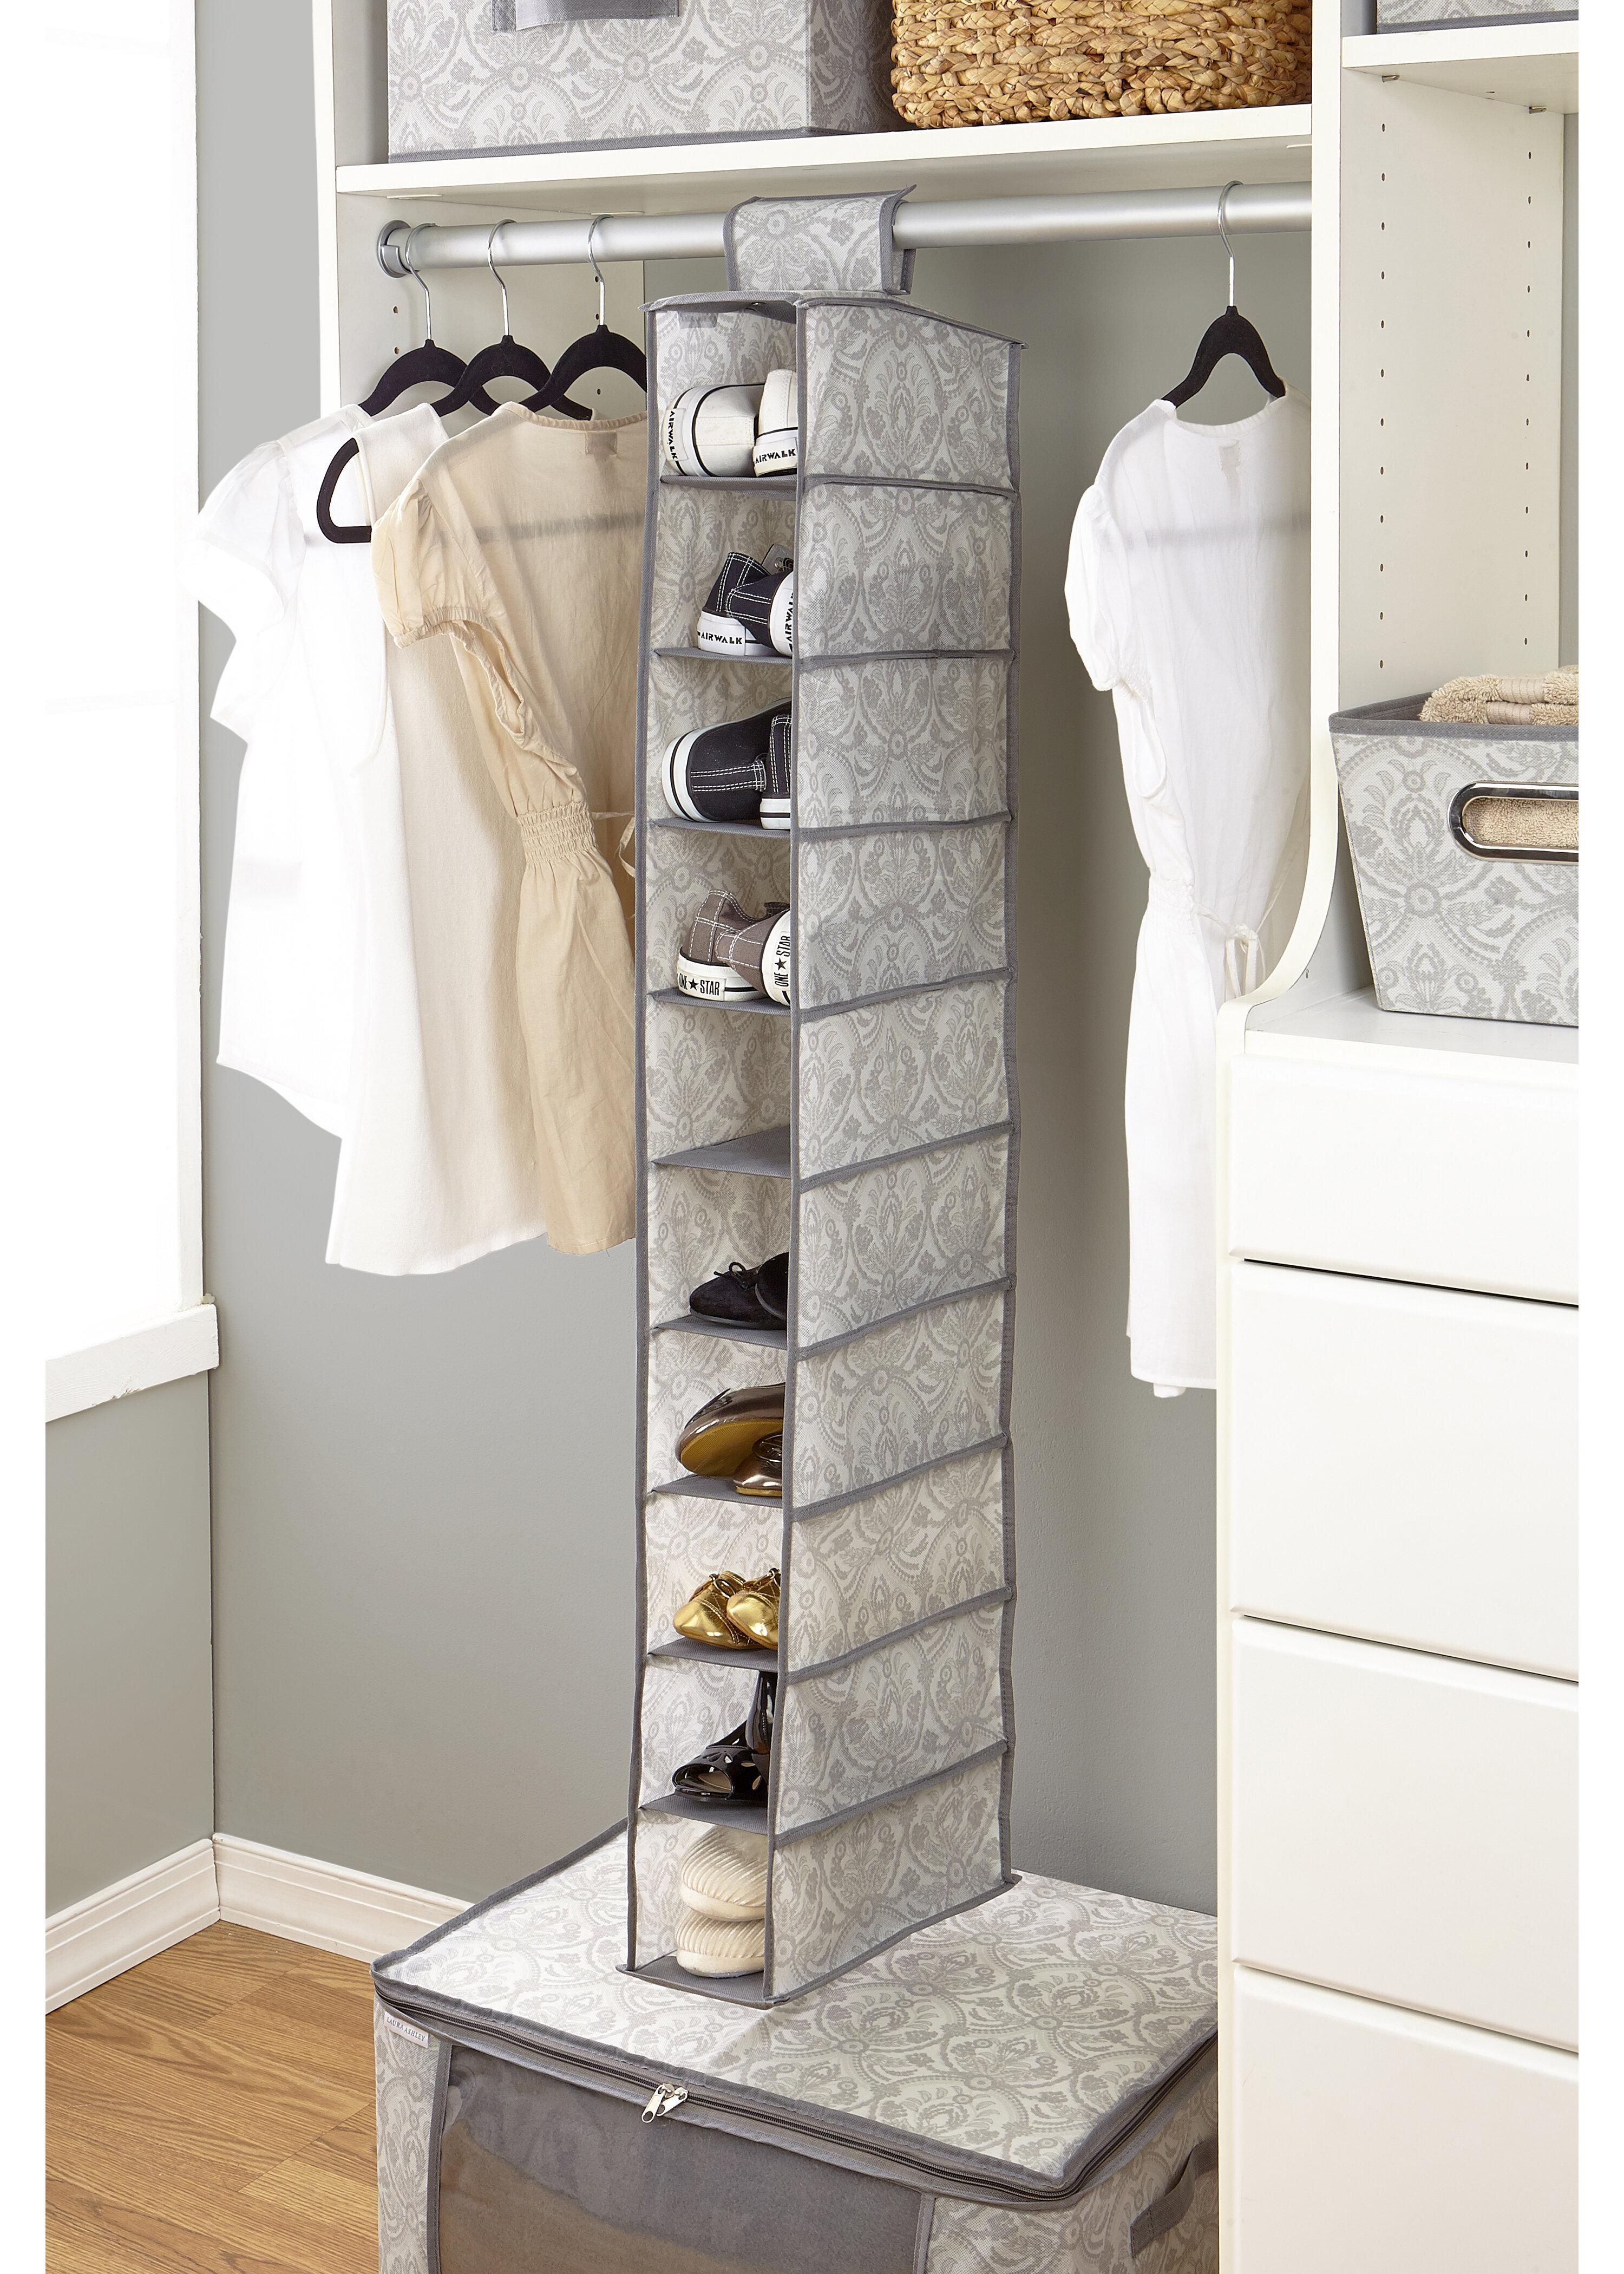 Laura Ashley Almeida 10 Compartment Hanging Shoe Organizer Reviews Wayfair